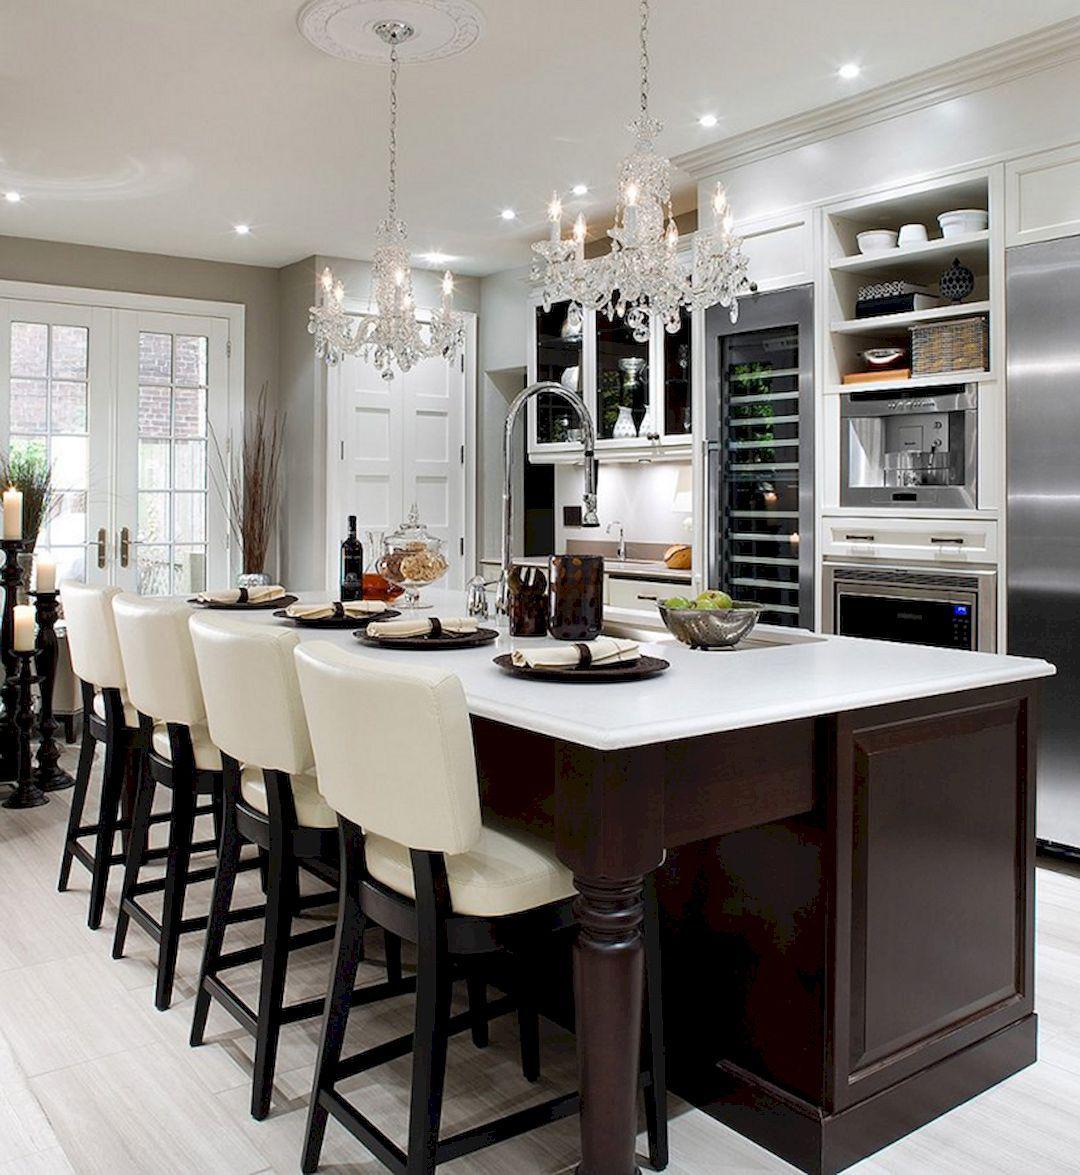 Kitchen Ideas | Kitchen Design Inspiration | Gallery of Images